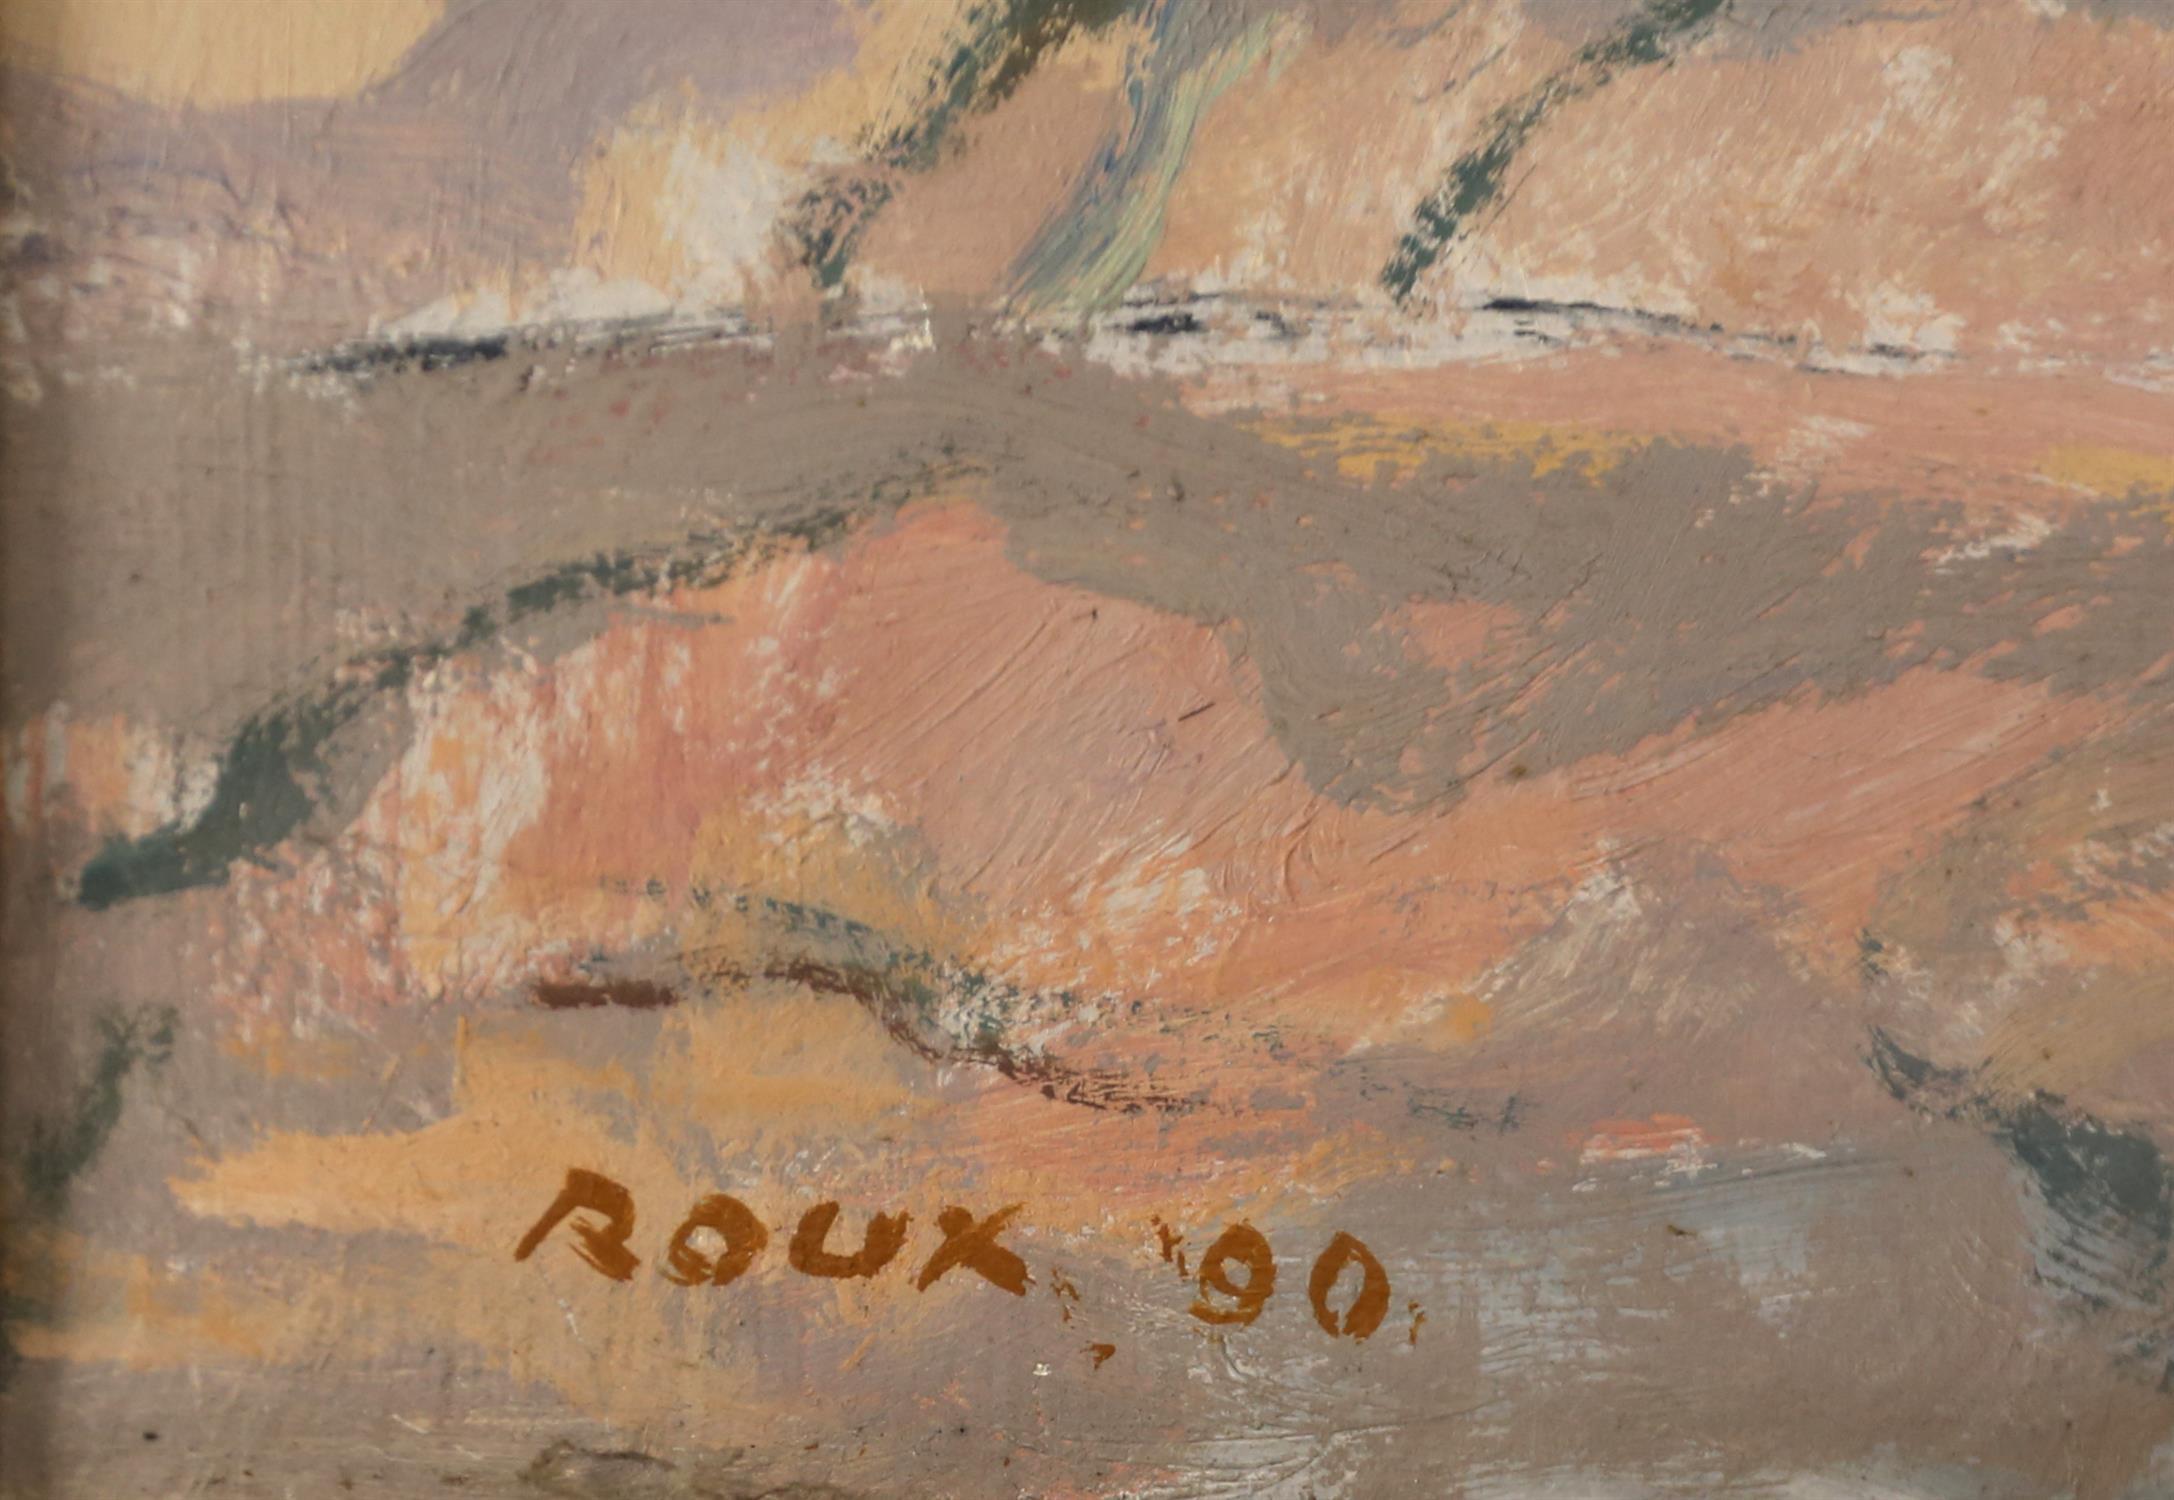 Francois Roux (South African, b. 1927). Cederberg, mountainous landscape. Oil on canvas, - Image 3 of 3